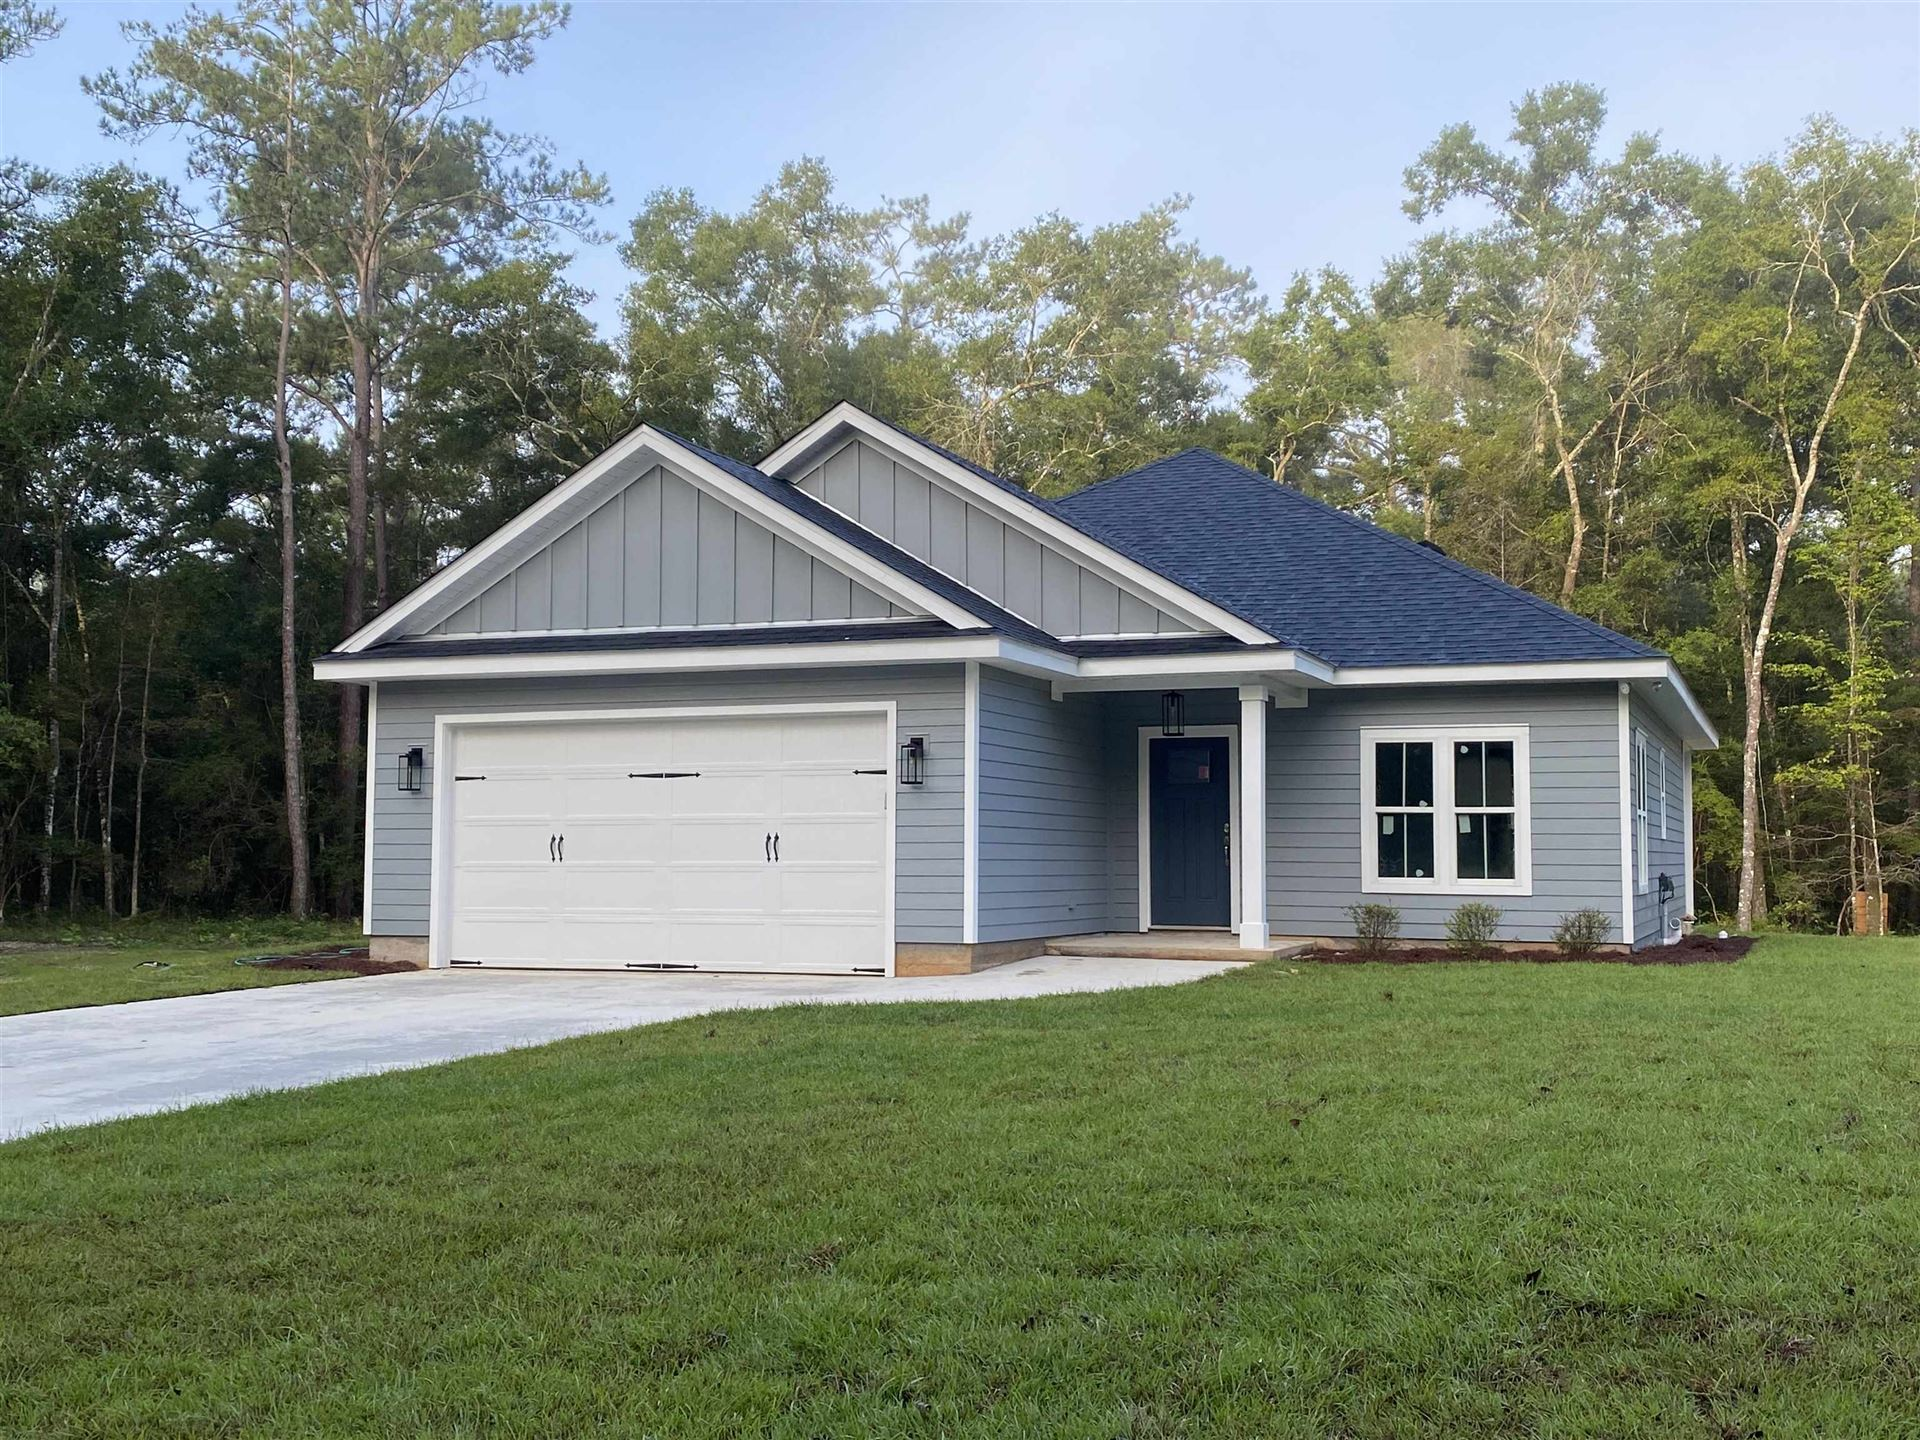 12680 Roalde Road, Tallahassee, FL 32317 - MLS#: 332793